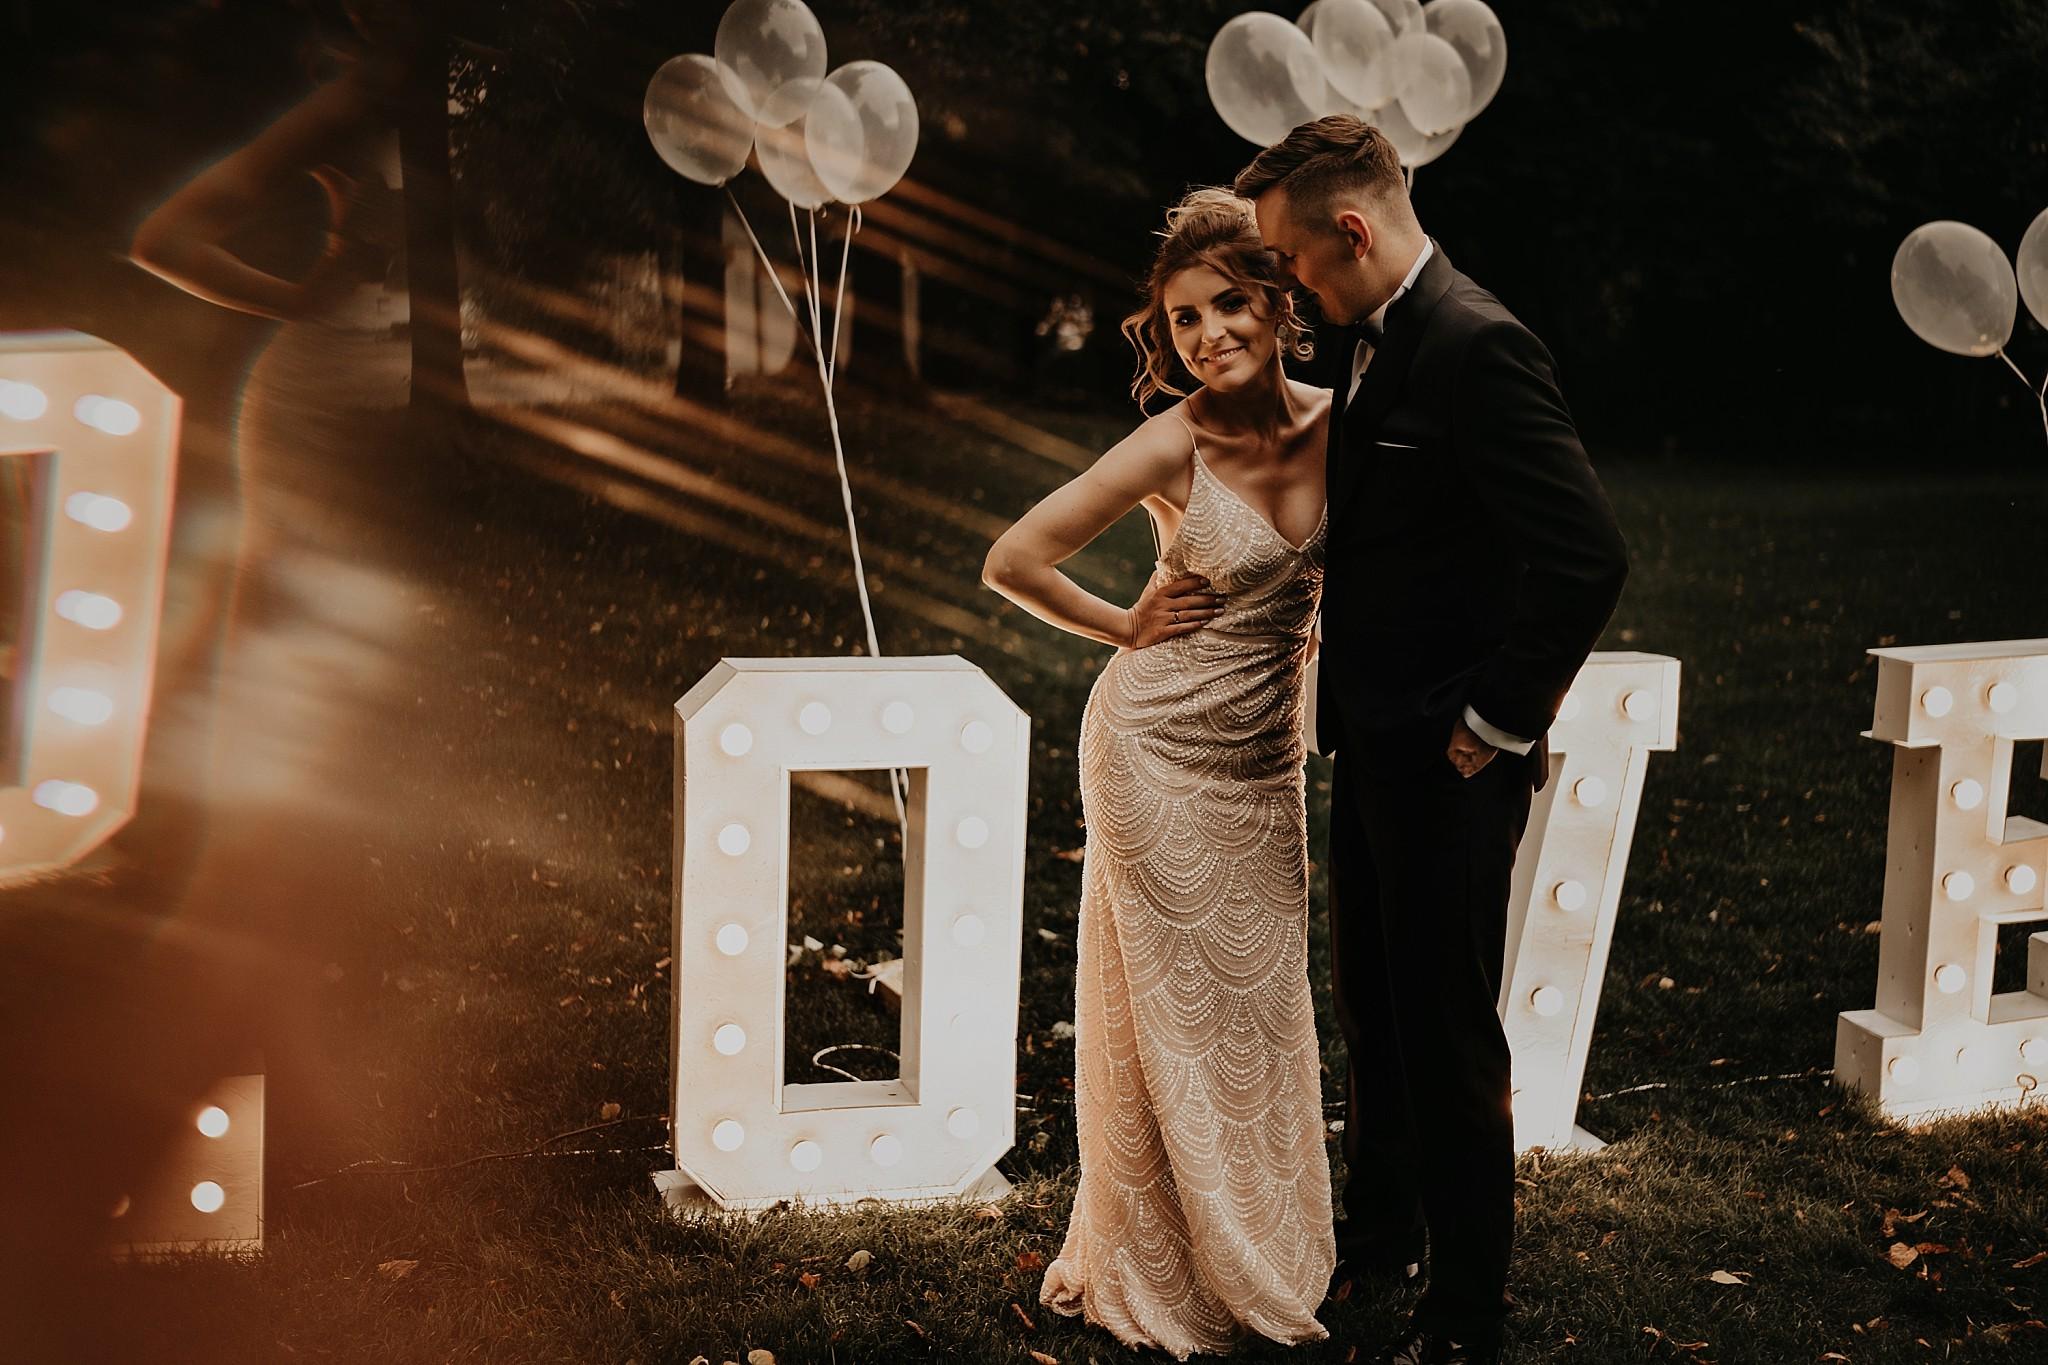 fotograf poznan wesele dobra truskawka piekne wesele pod poznaniem wesele w dobrej truskawce piekna para mloda slub marzen slub koronawirus slub listopad wesele koronawirus 350